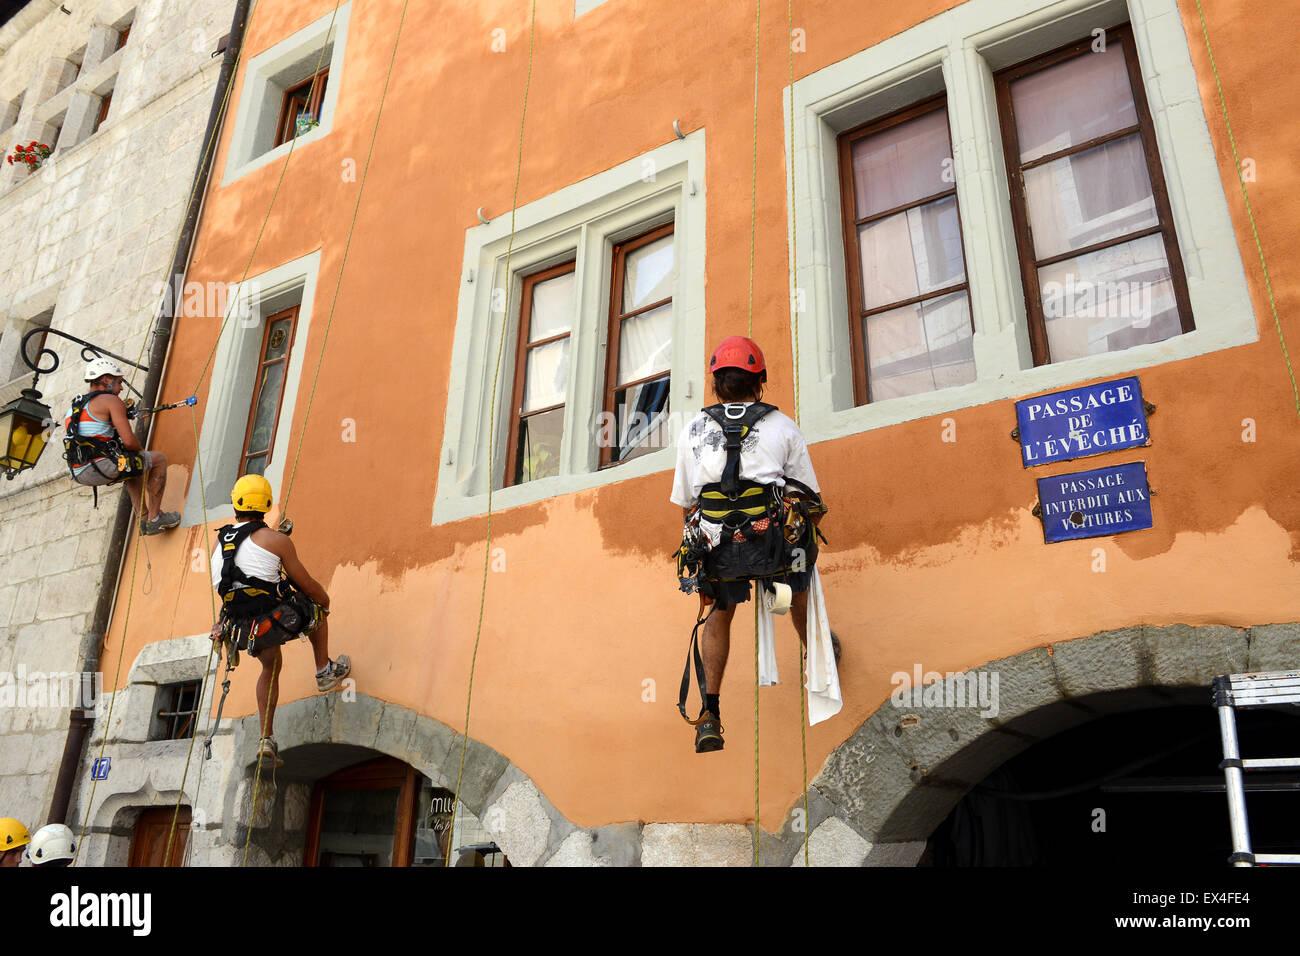 Klettergurt Abseilen : Klettern brÜcke abseilen youtube